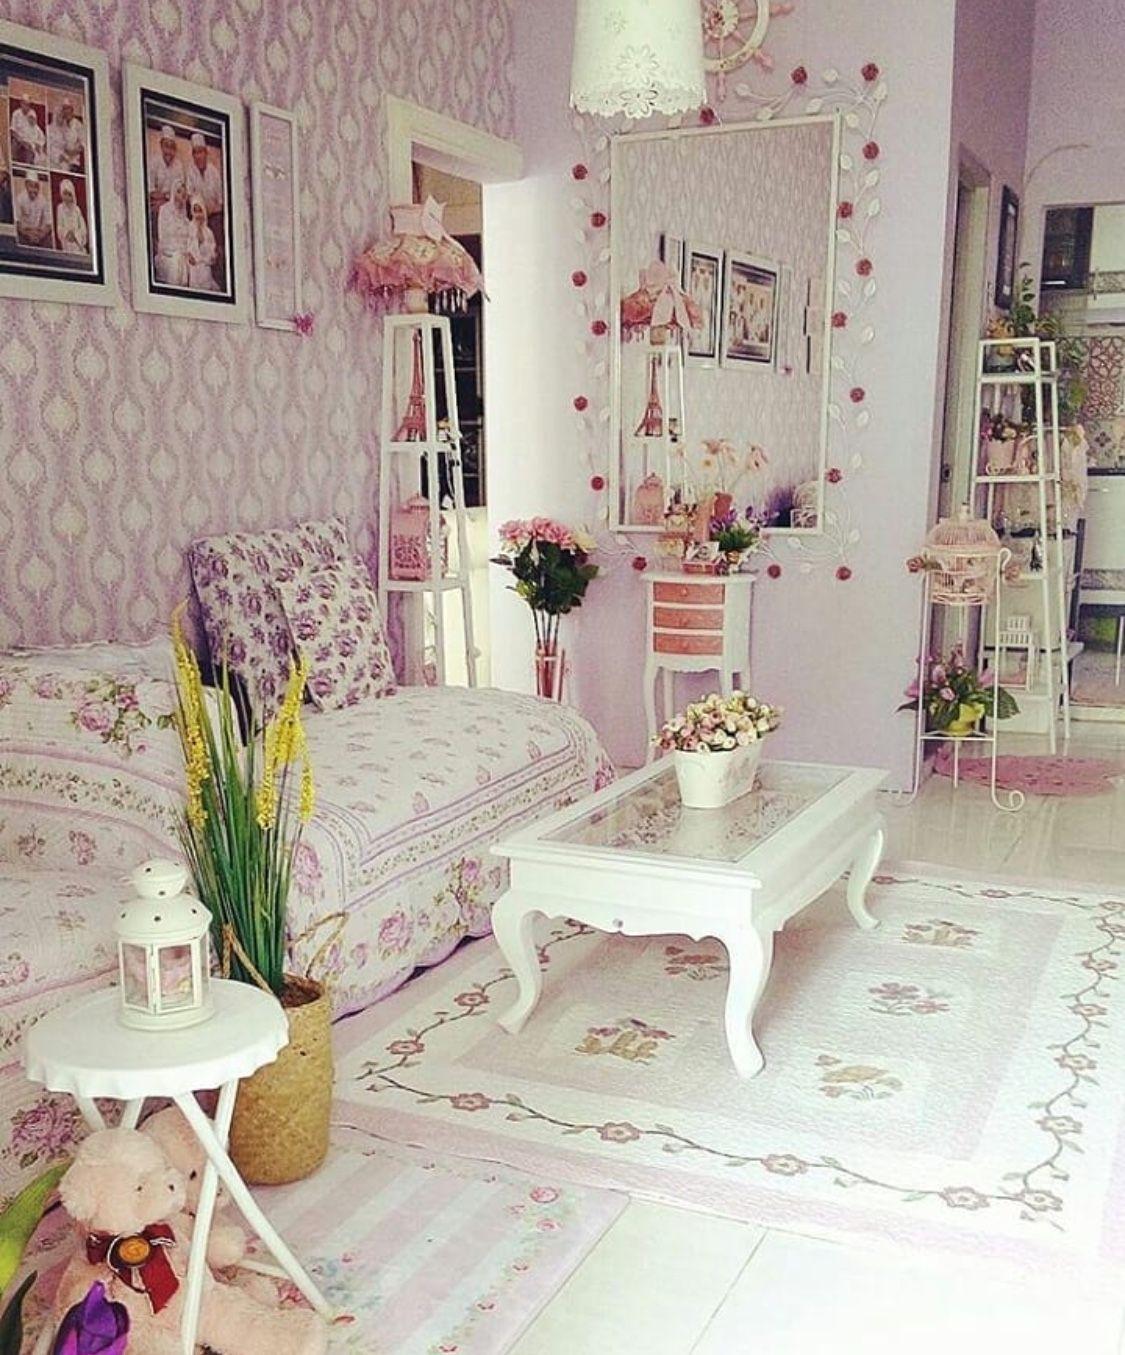 Shabby Chic Decor Shabby Chic Living Room Shabby Chic Furniture Chic Living Room